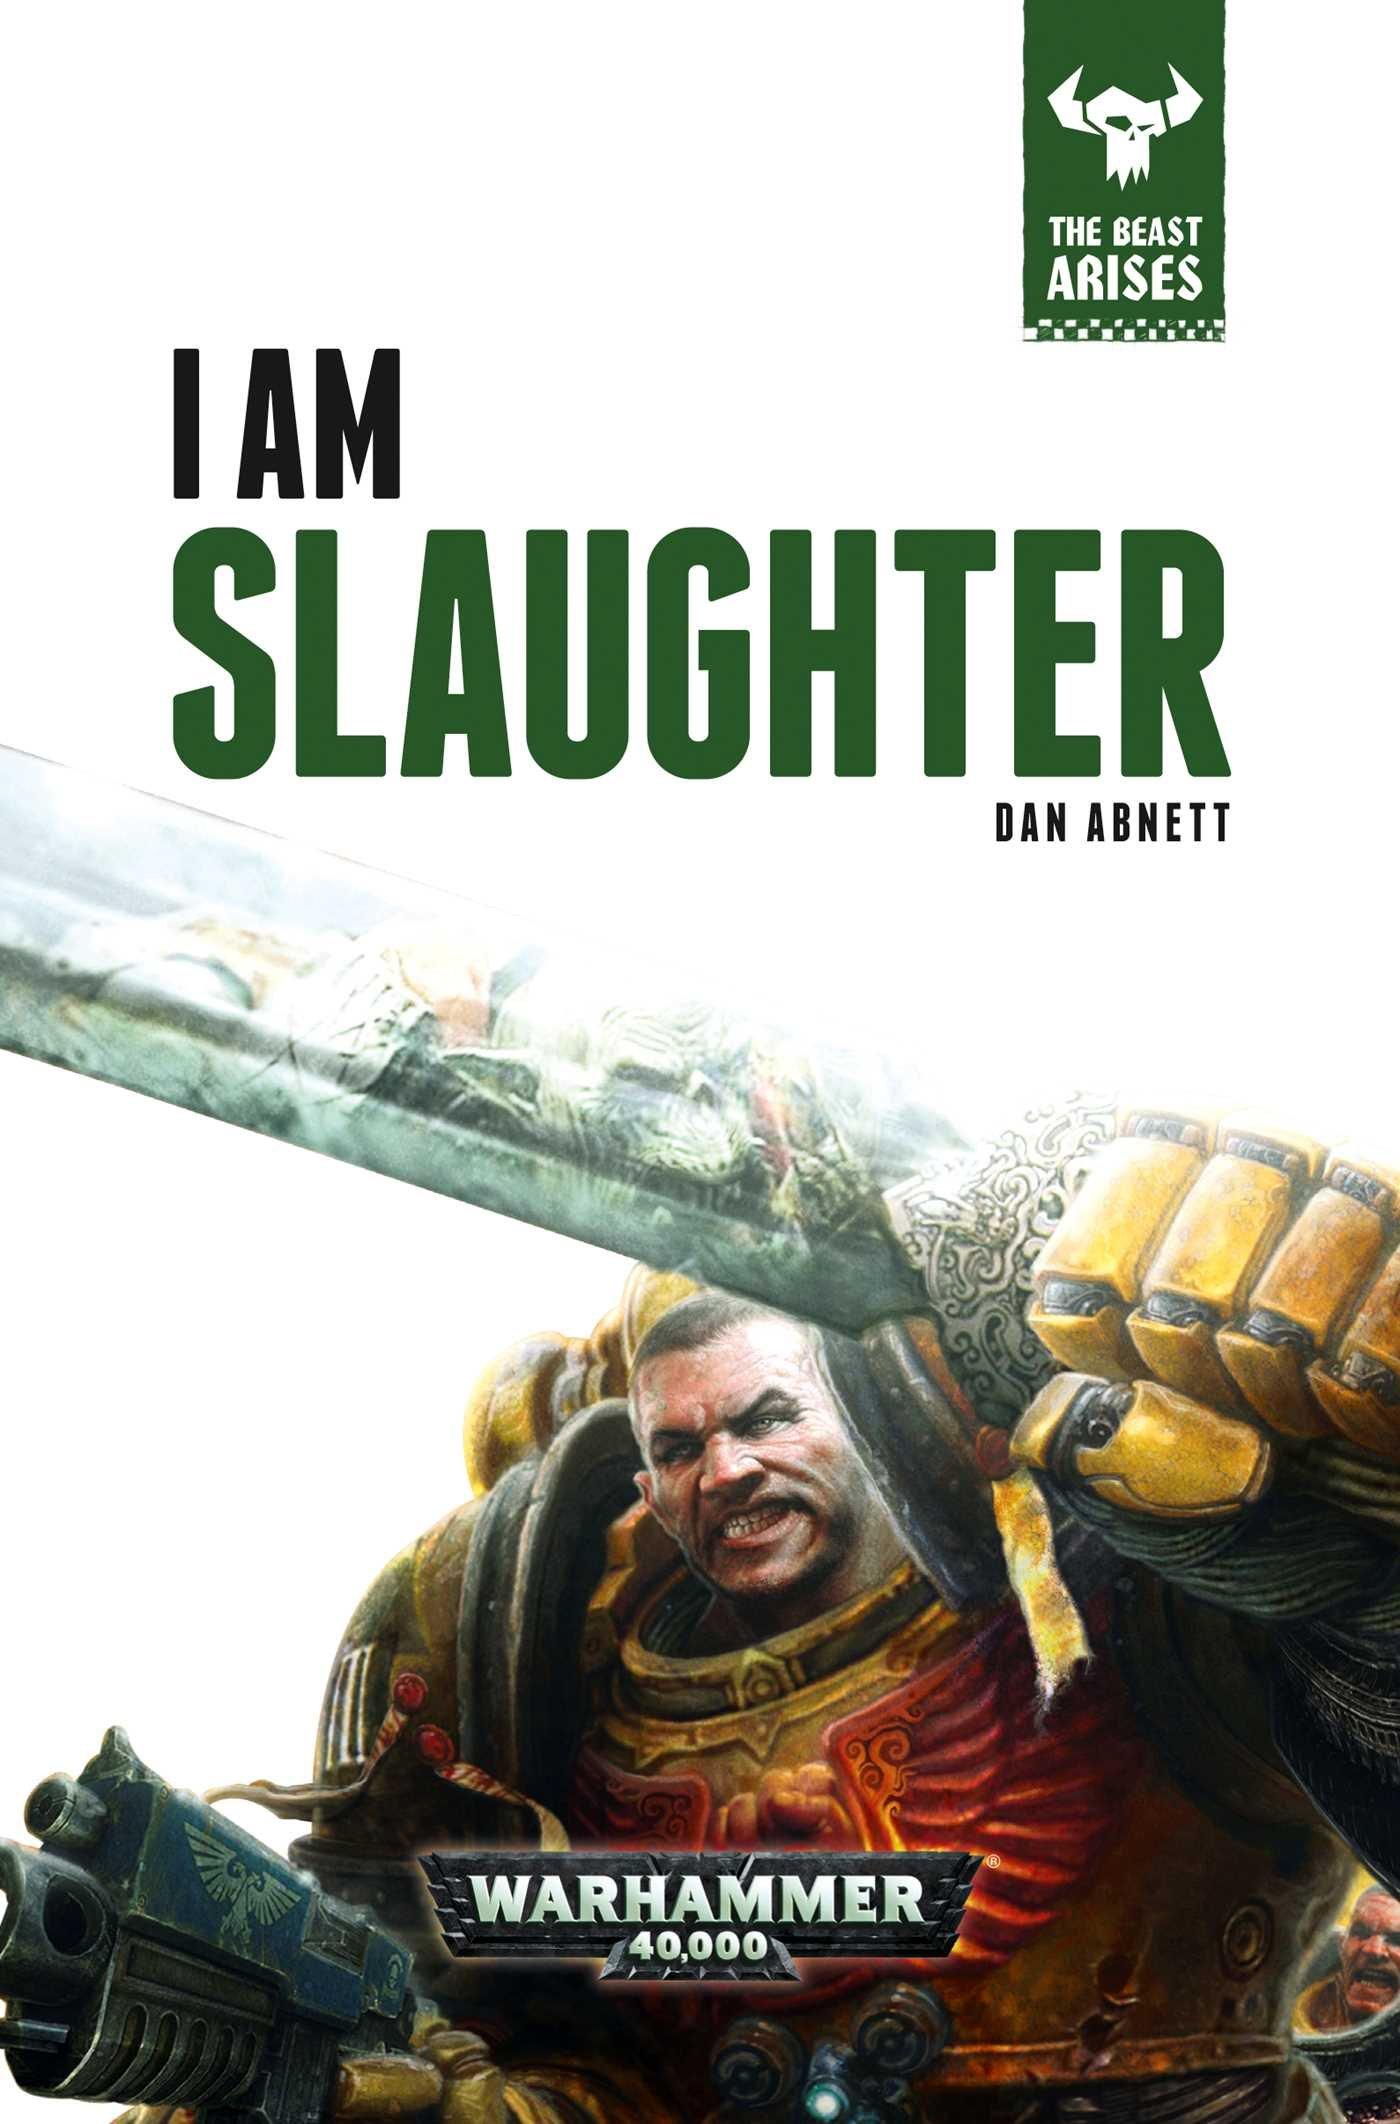 Amazon: I Am Slaughter (the Beast Arises) (9781784960674): Dan Abnett:  Books